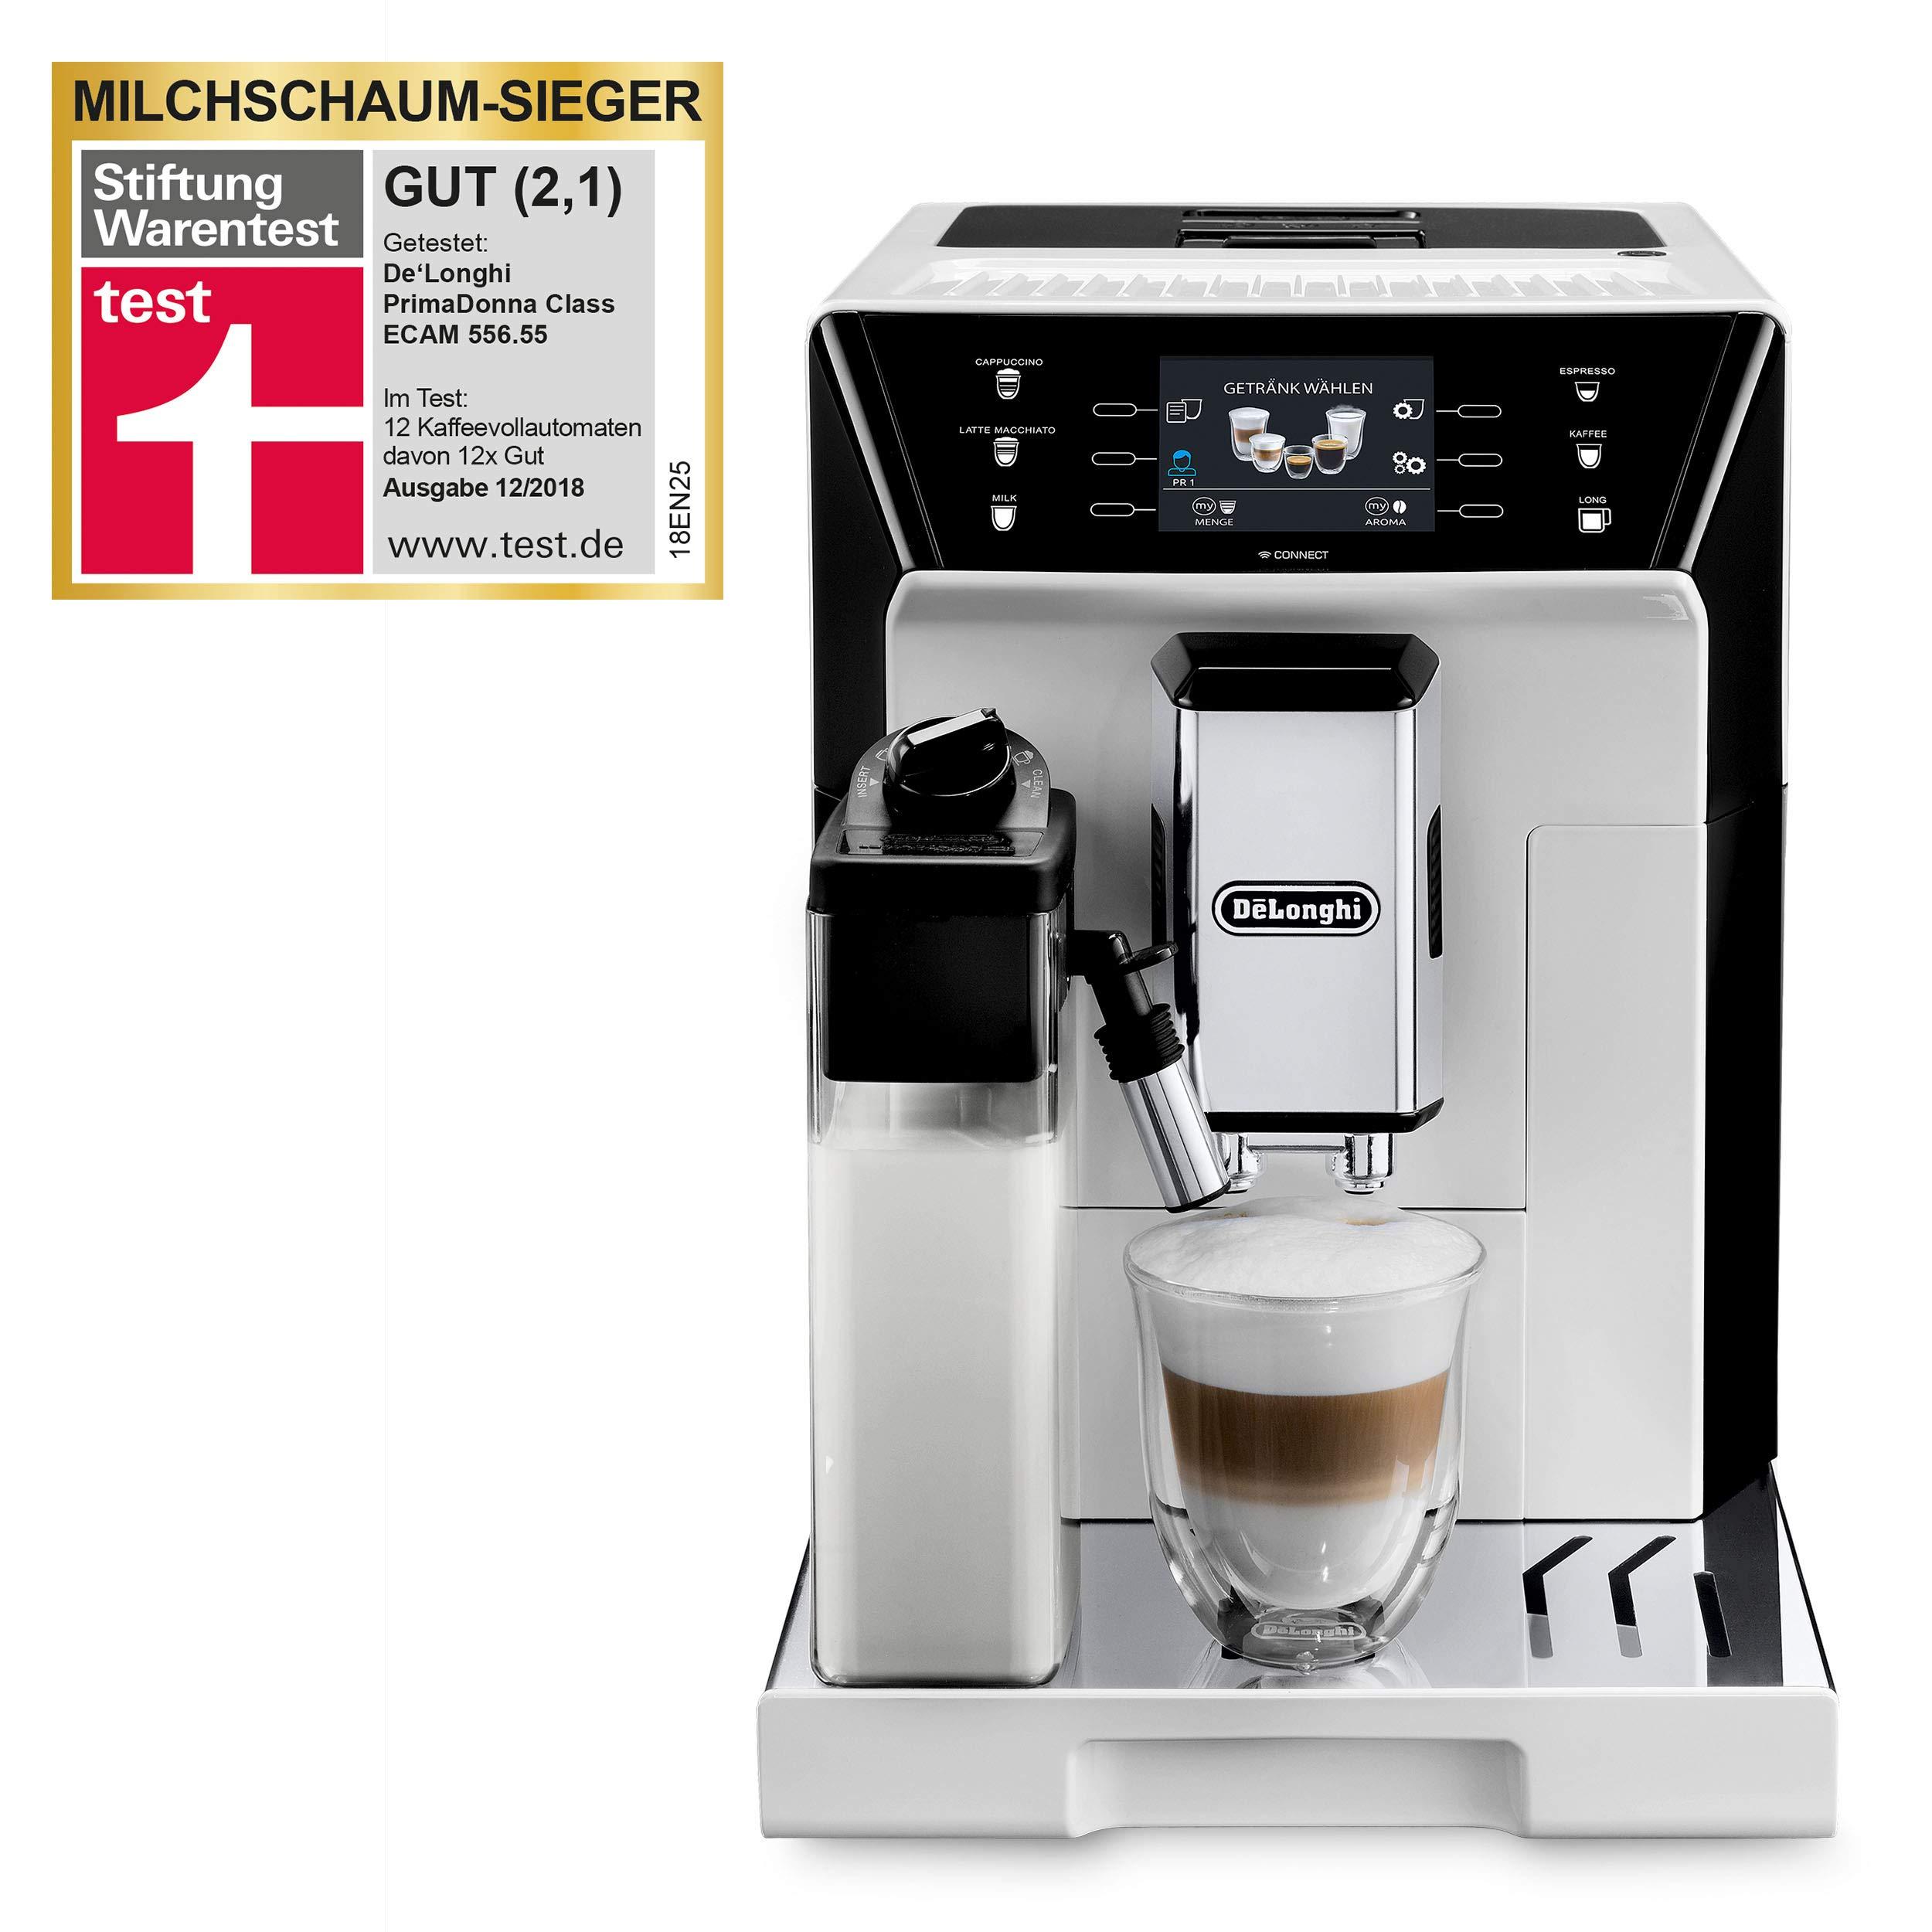 De'Longhi ECAM 556.55.W PrimaDonna Class Kaffeevollautomat mit App-Steuerung